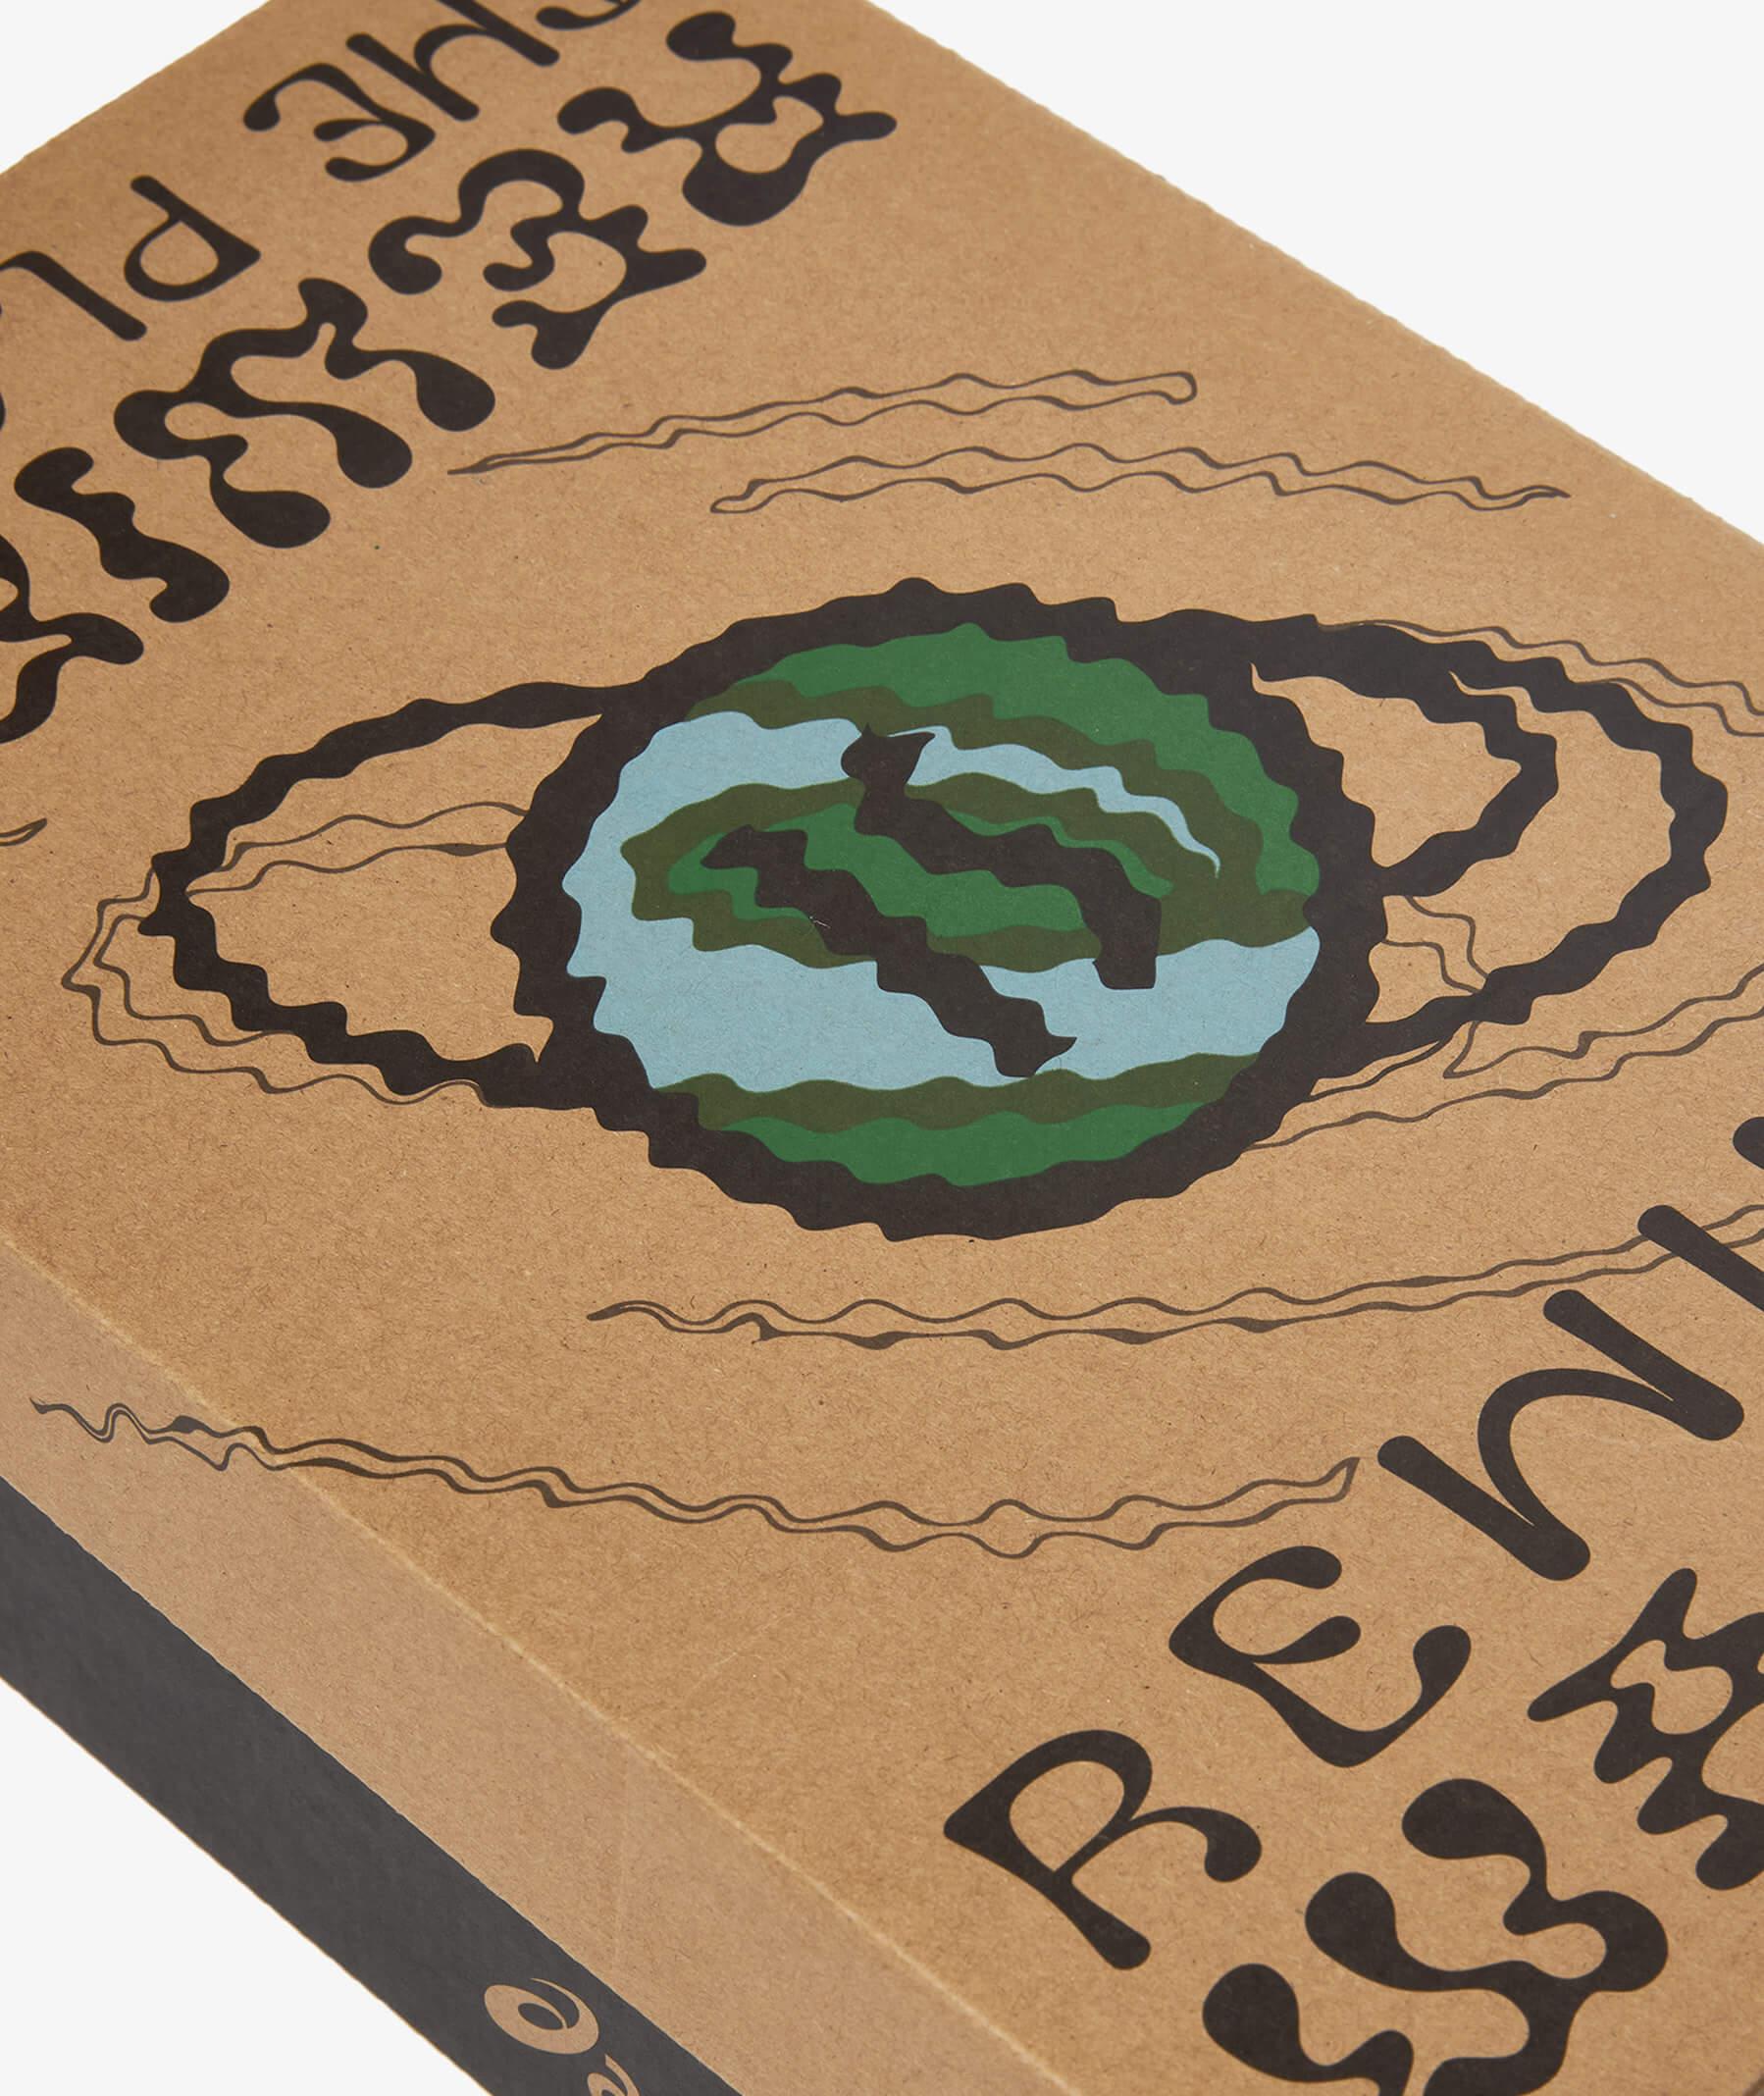 eco friendly box - ASICSSportStyle x SIVASDESCALZO (SVD)- GEL-LYTEIIIOG- Rewind The Planet - beige/black - 1203A122-250